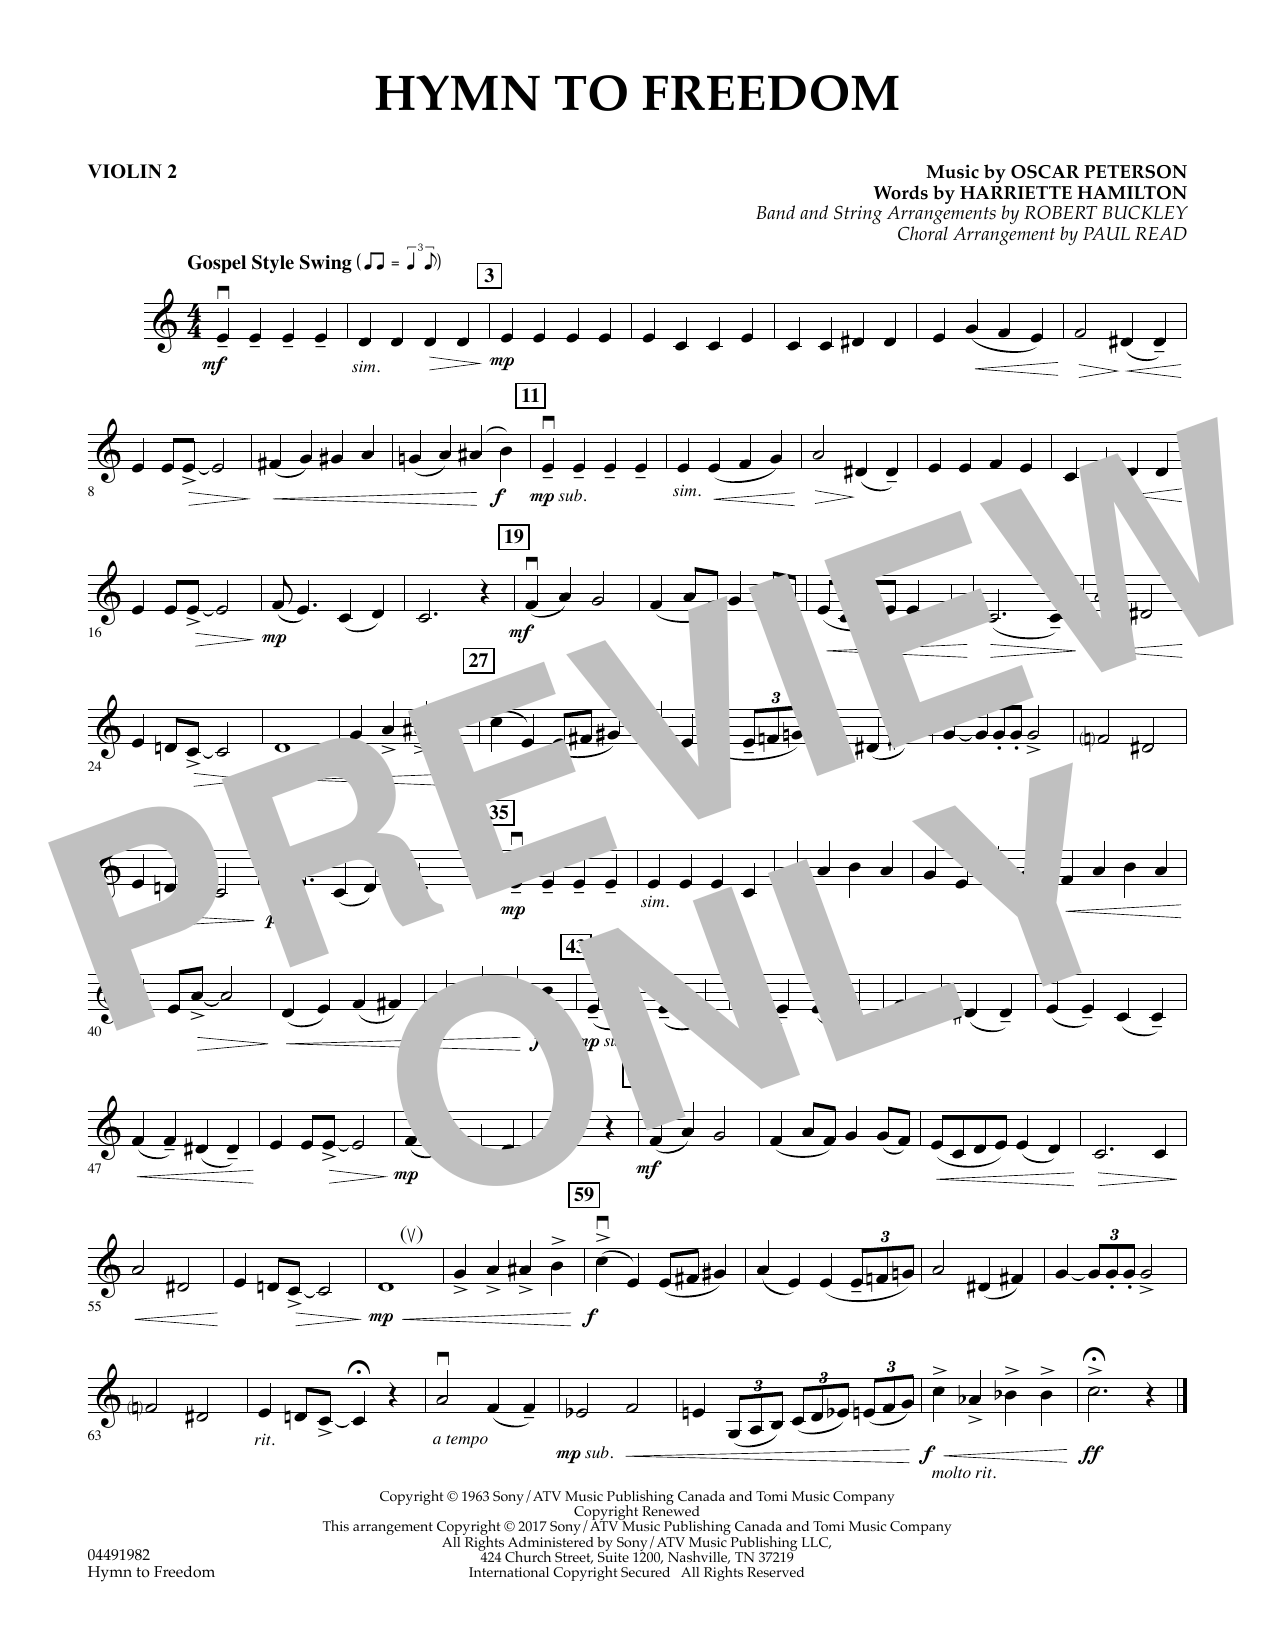 Paul Read - Hymn to Freedom - Violin 2